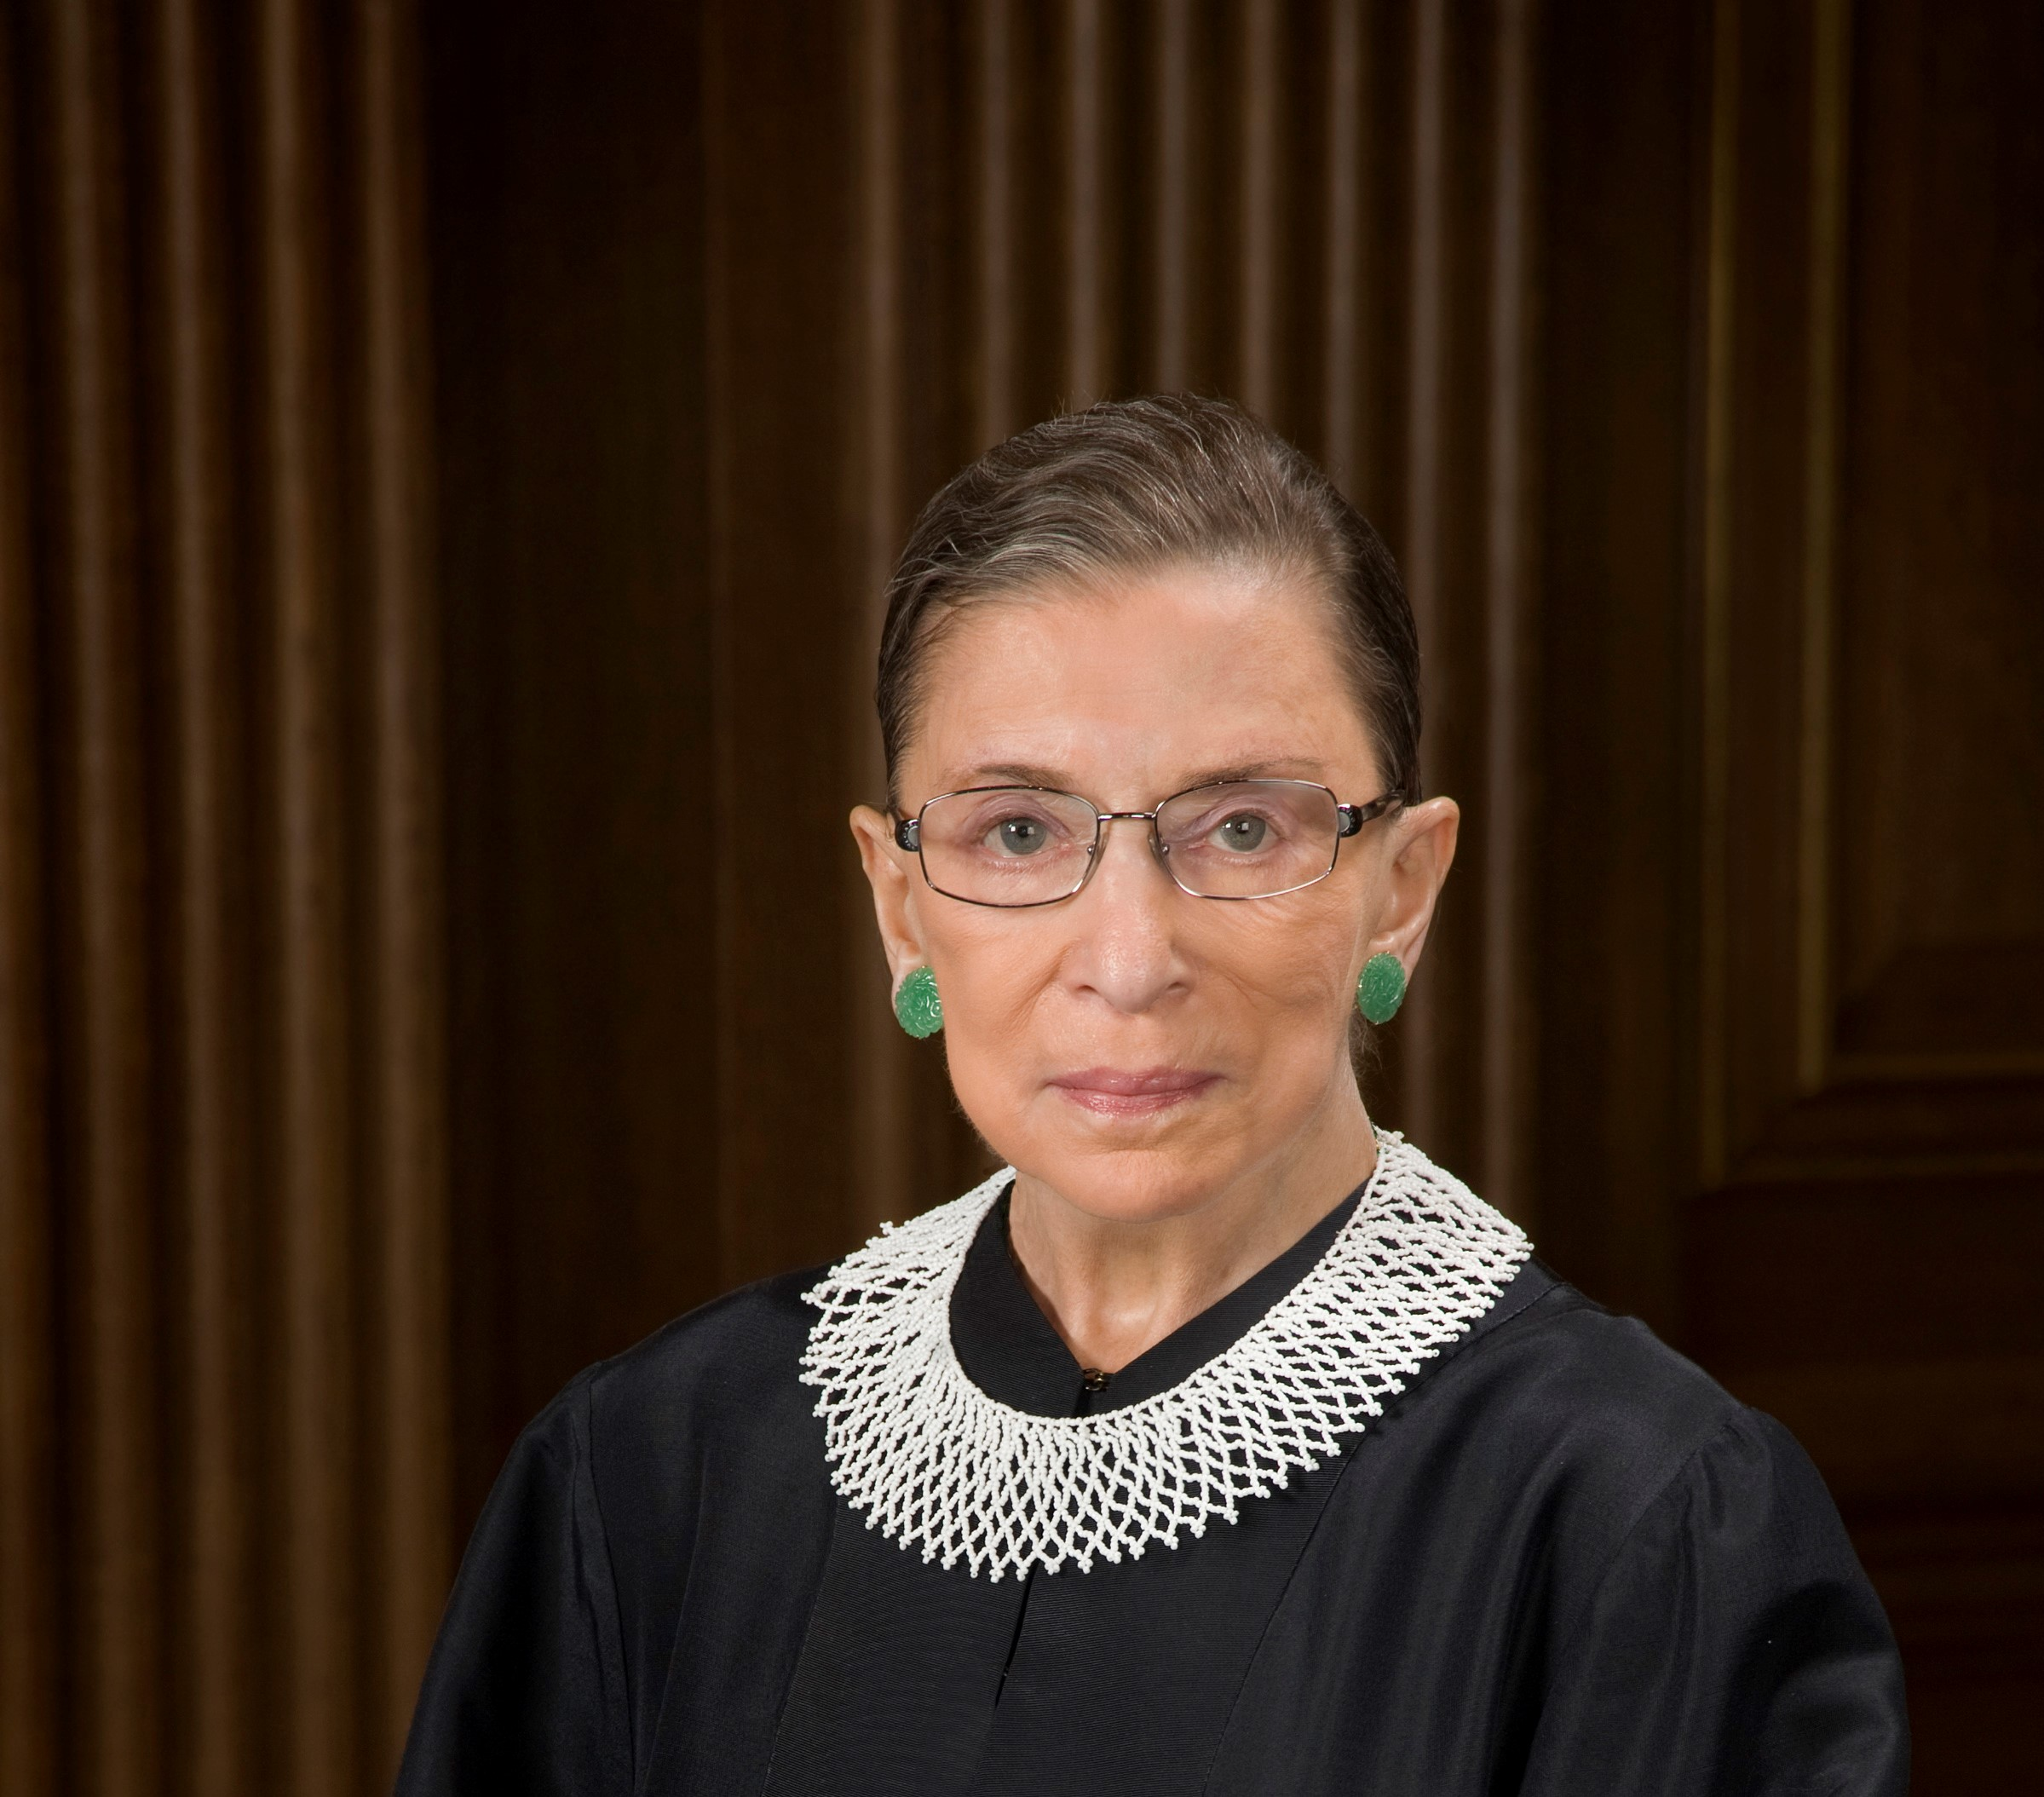 Ruth_Bader_Ginsburg_official_SCOTUS_portraitCROP.jpg